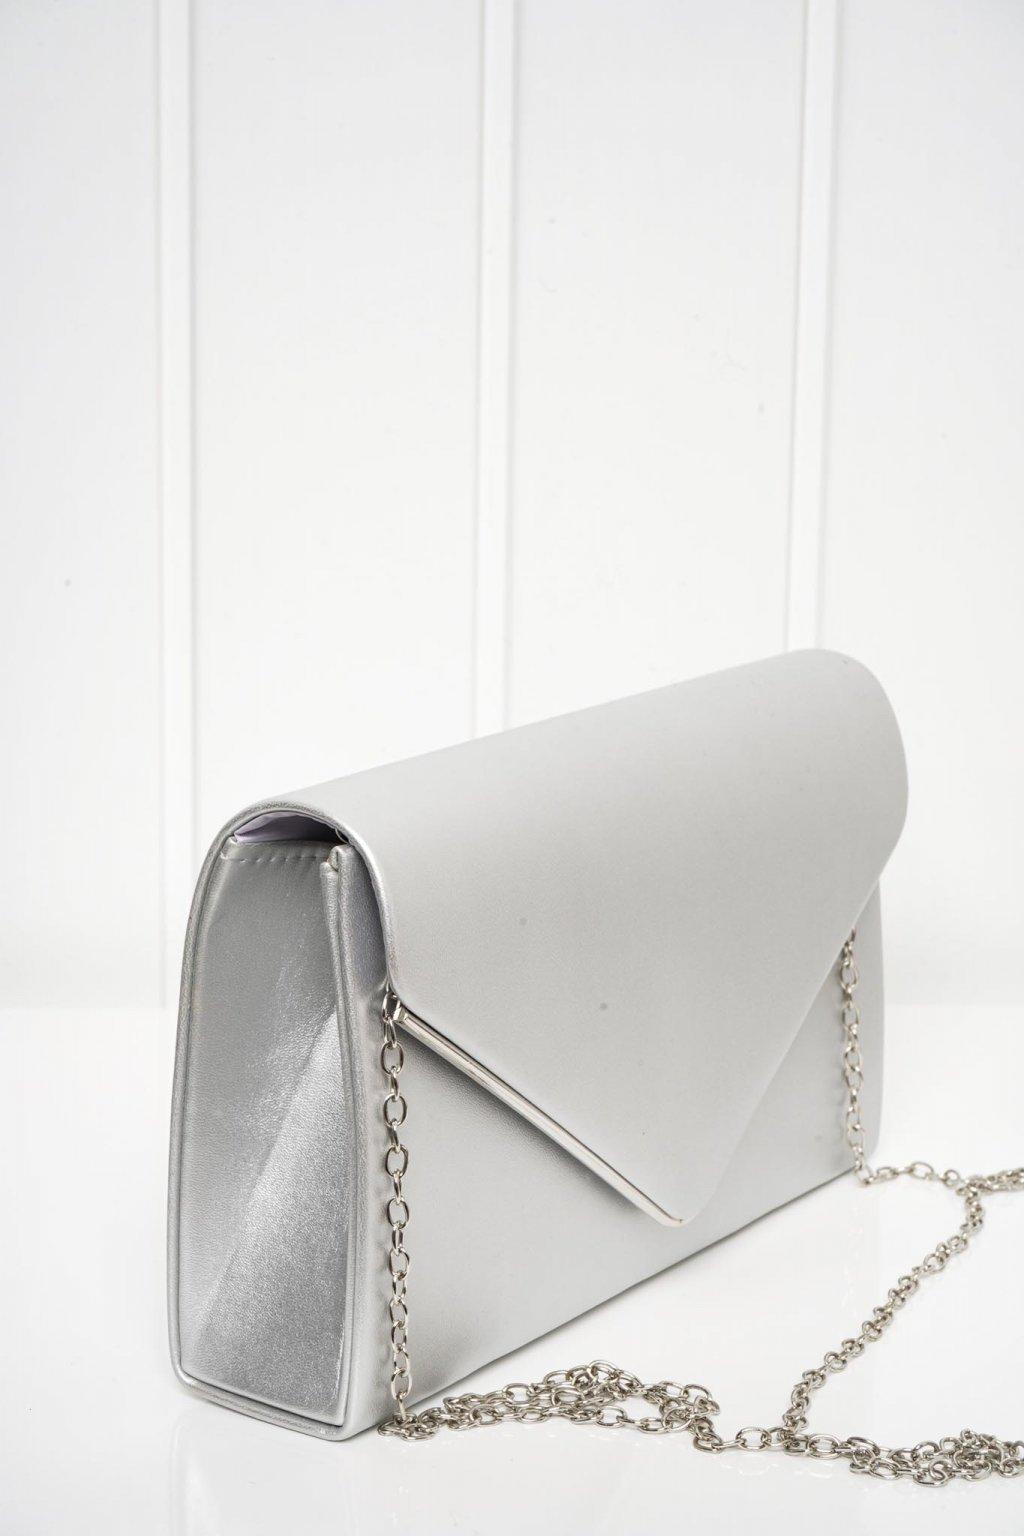 Kabelka, crossbody, ruksak, shopping bag, shopperka, 522